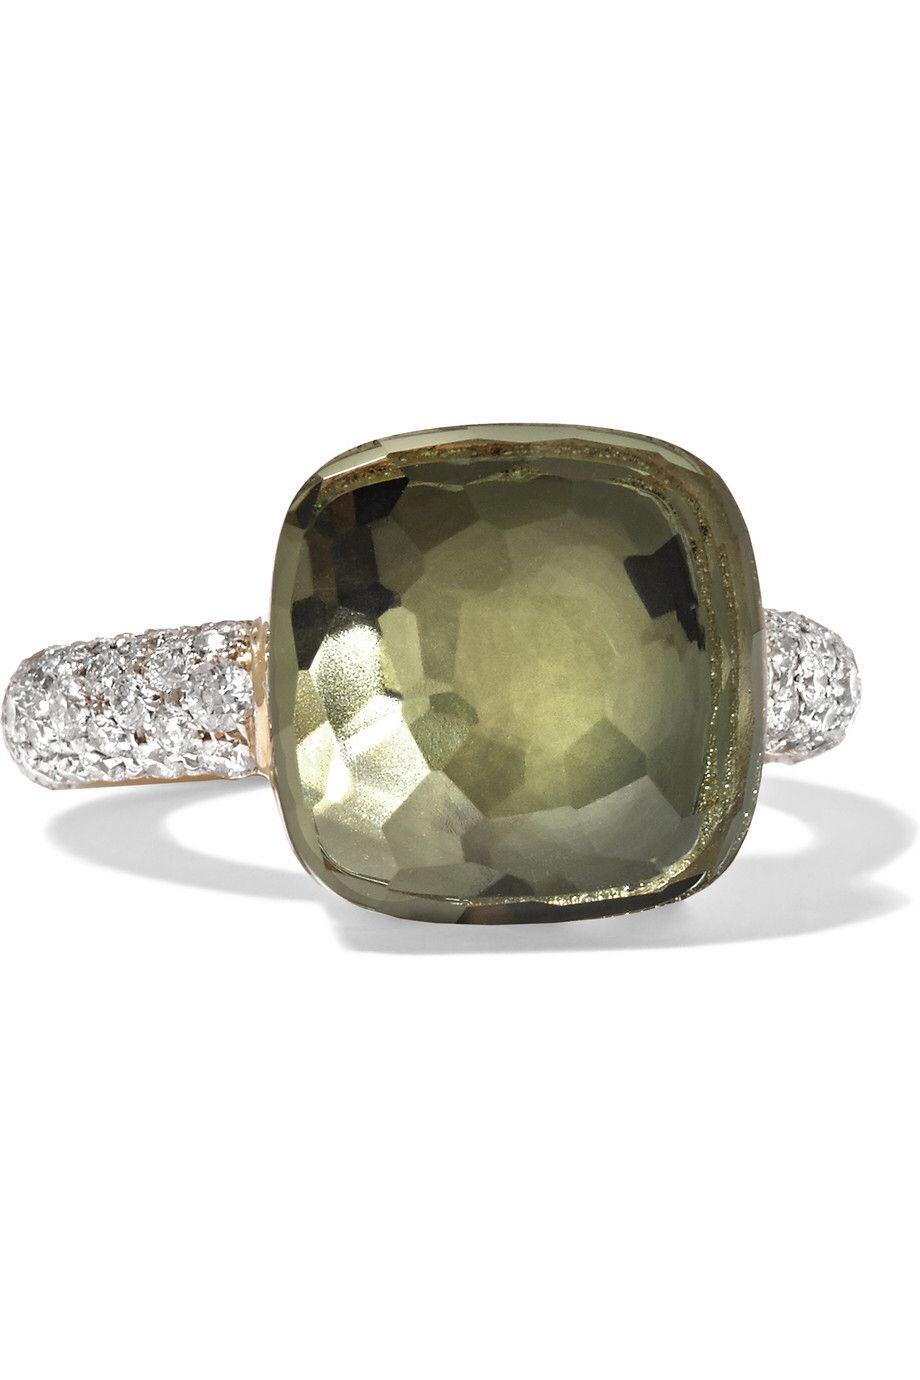 POMELLATO Nudo 18-karat Rose And White Gold, Prasiolite And Diamond Ring